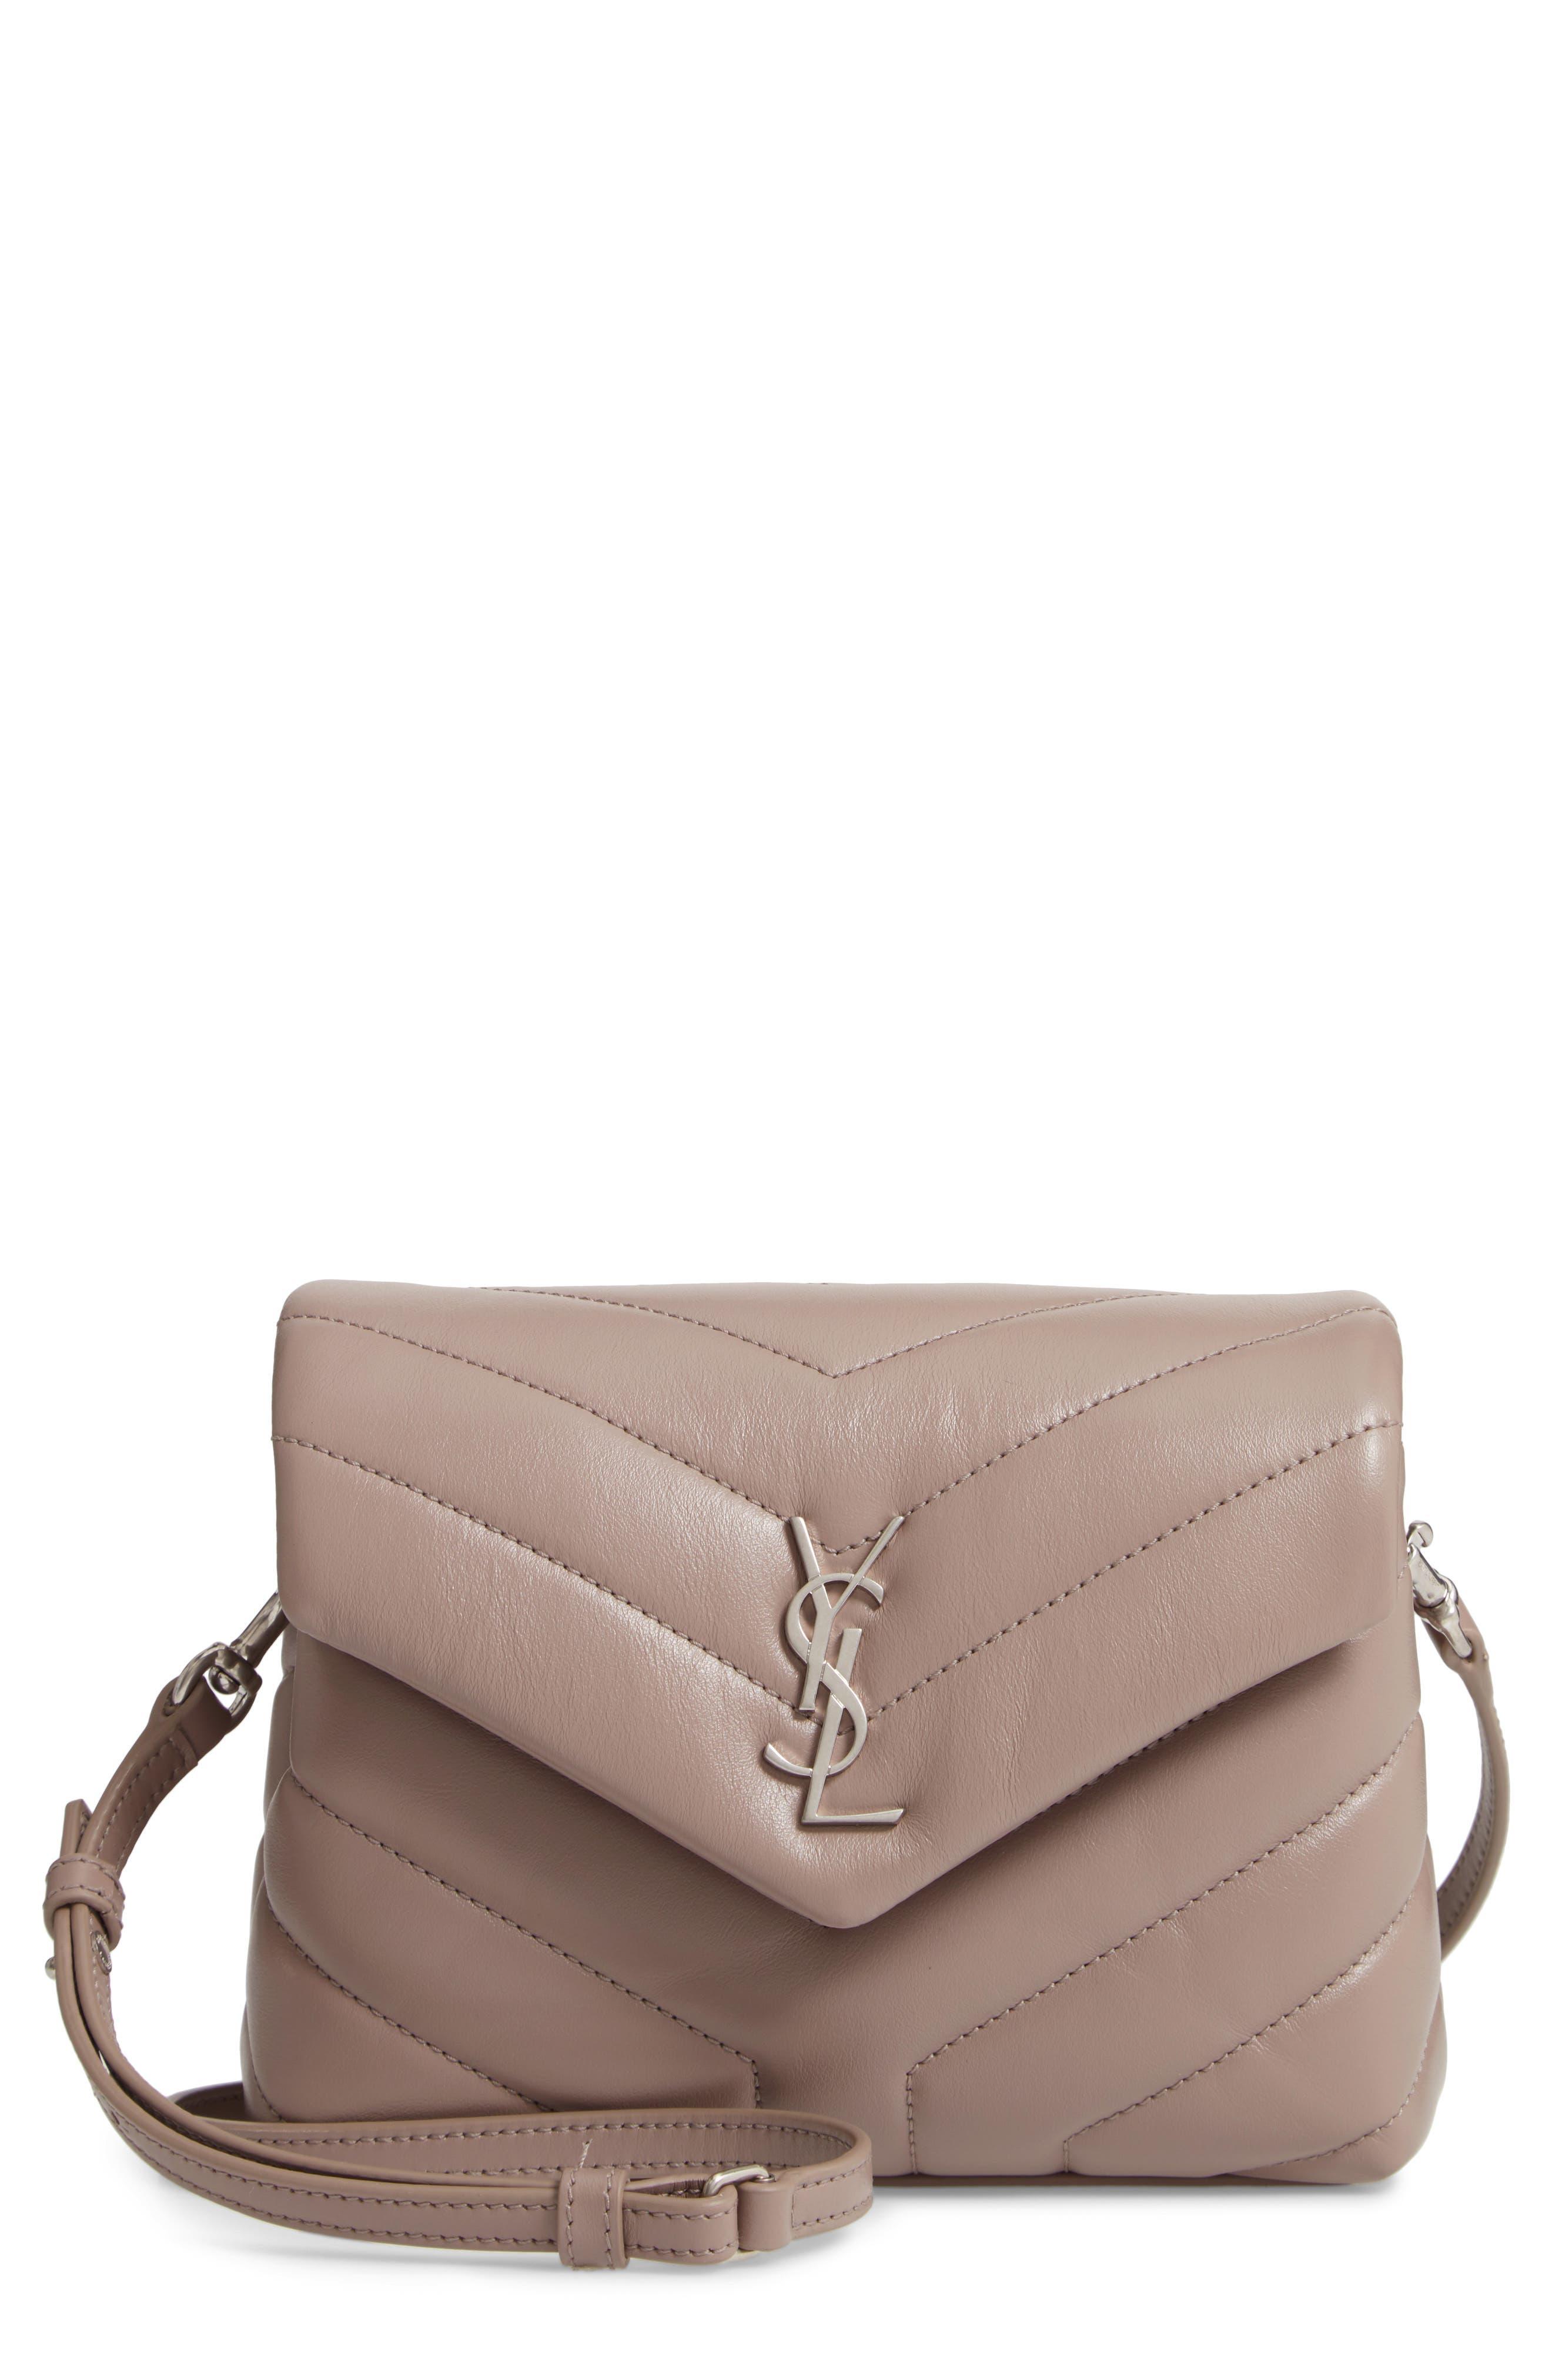 SAINT LAURENT, Toy Loulou Calfskin Leather Crossbody Bag, Main thumbnail 1, color, MINK